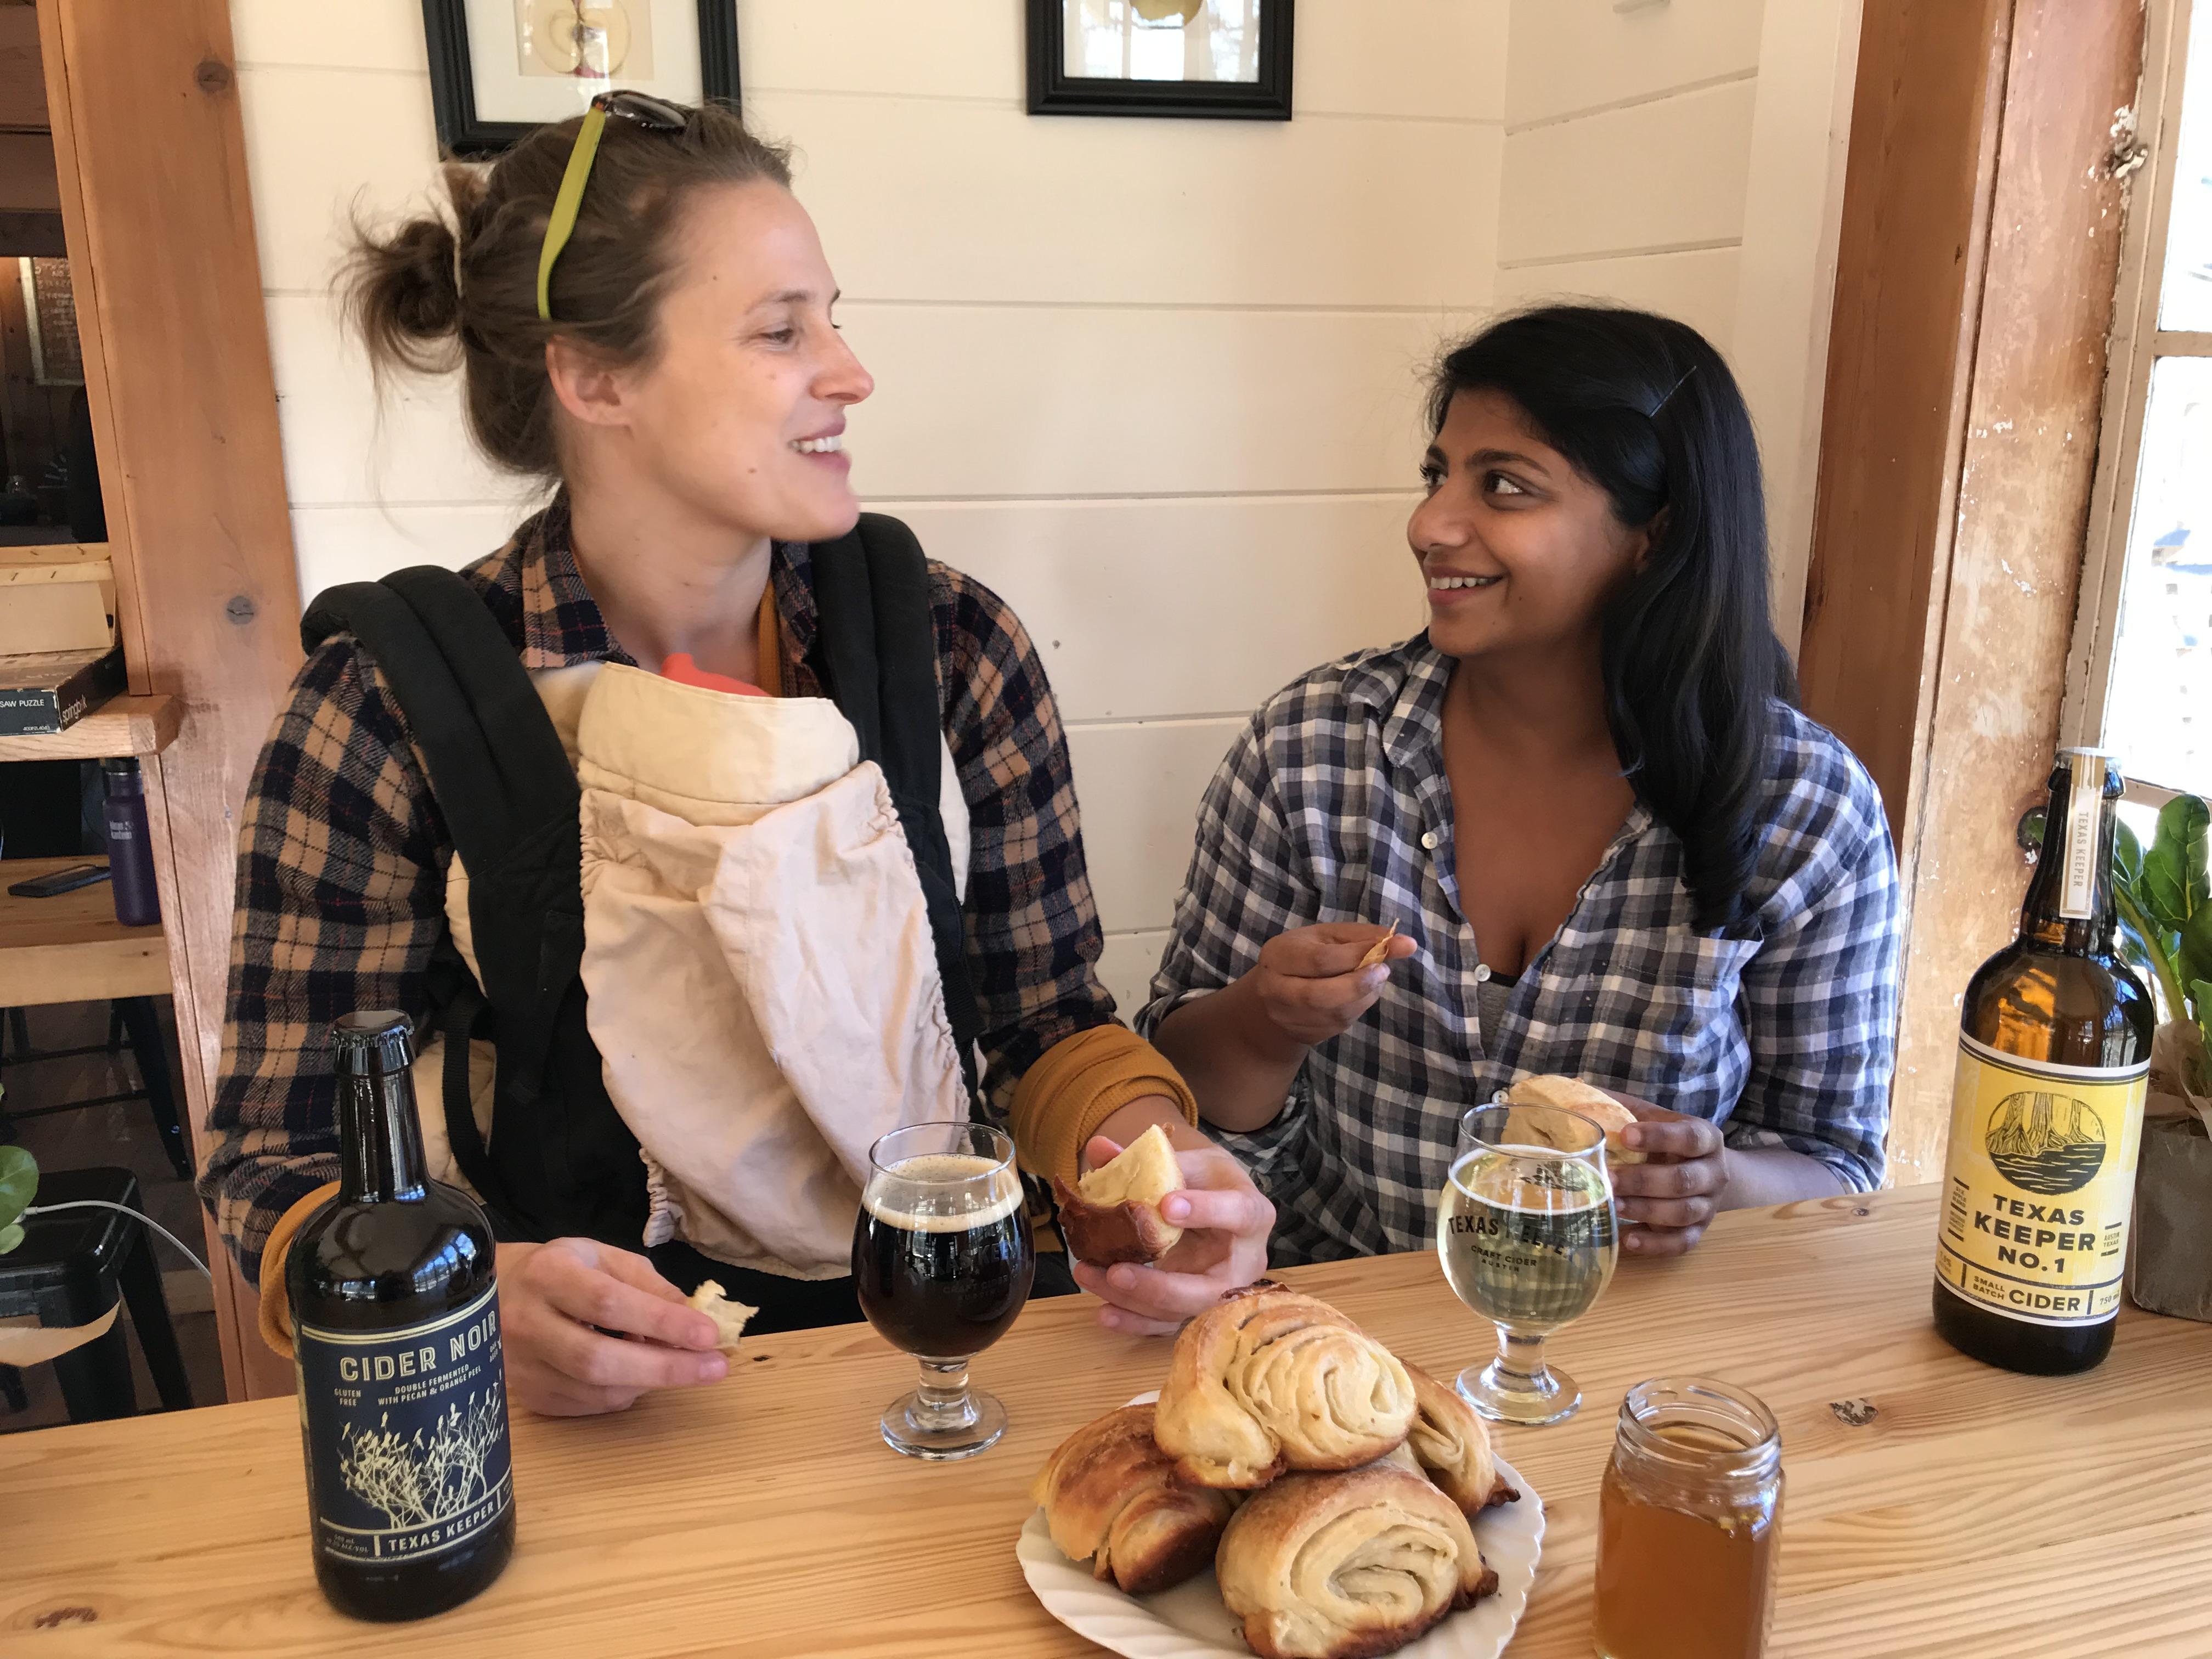 Texas Keeper Cider's Lindsey Peebles and Puli-Ra's Deepa Shridhar